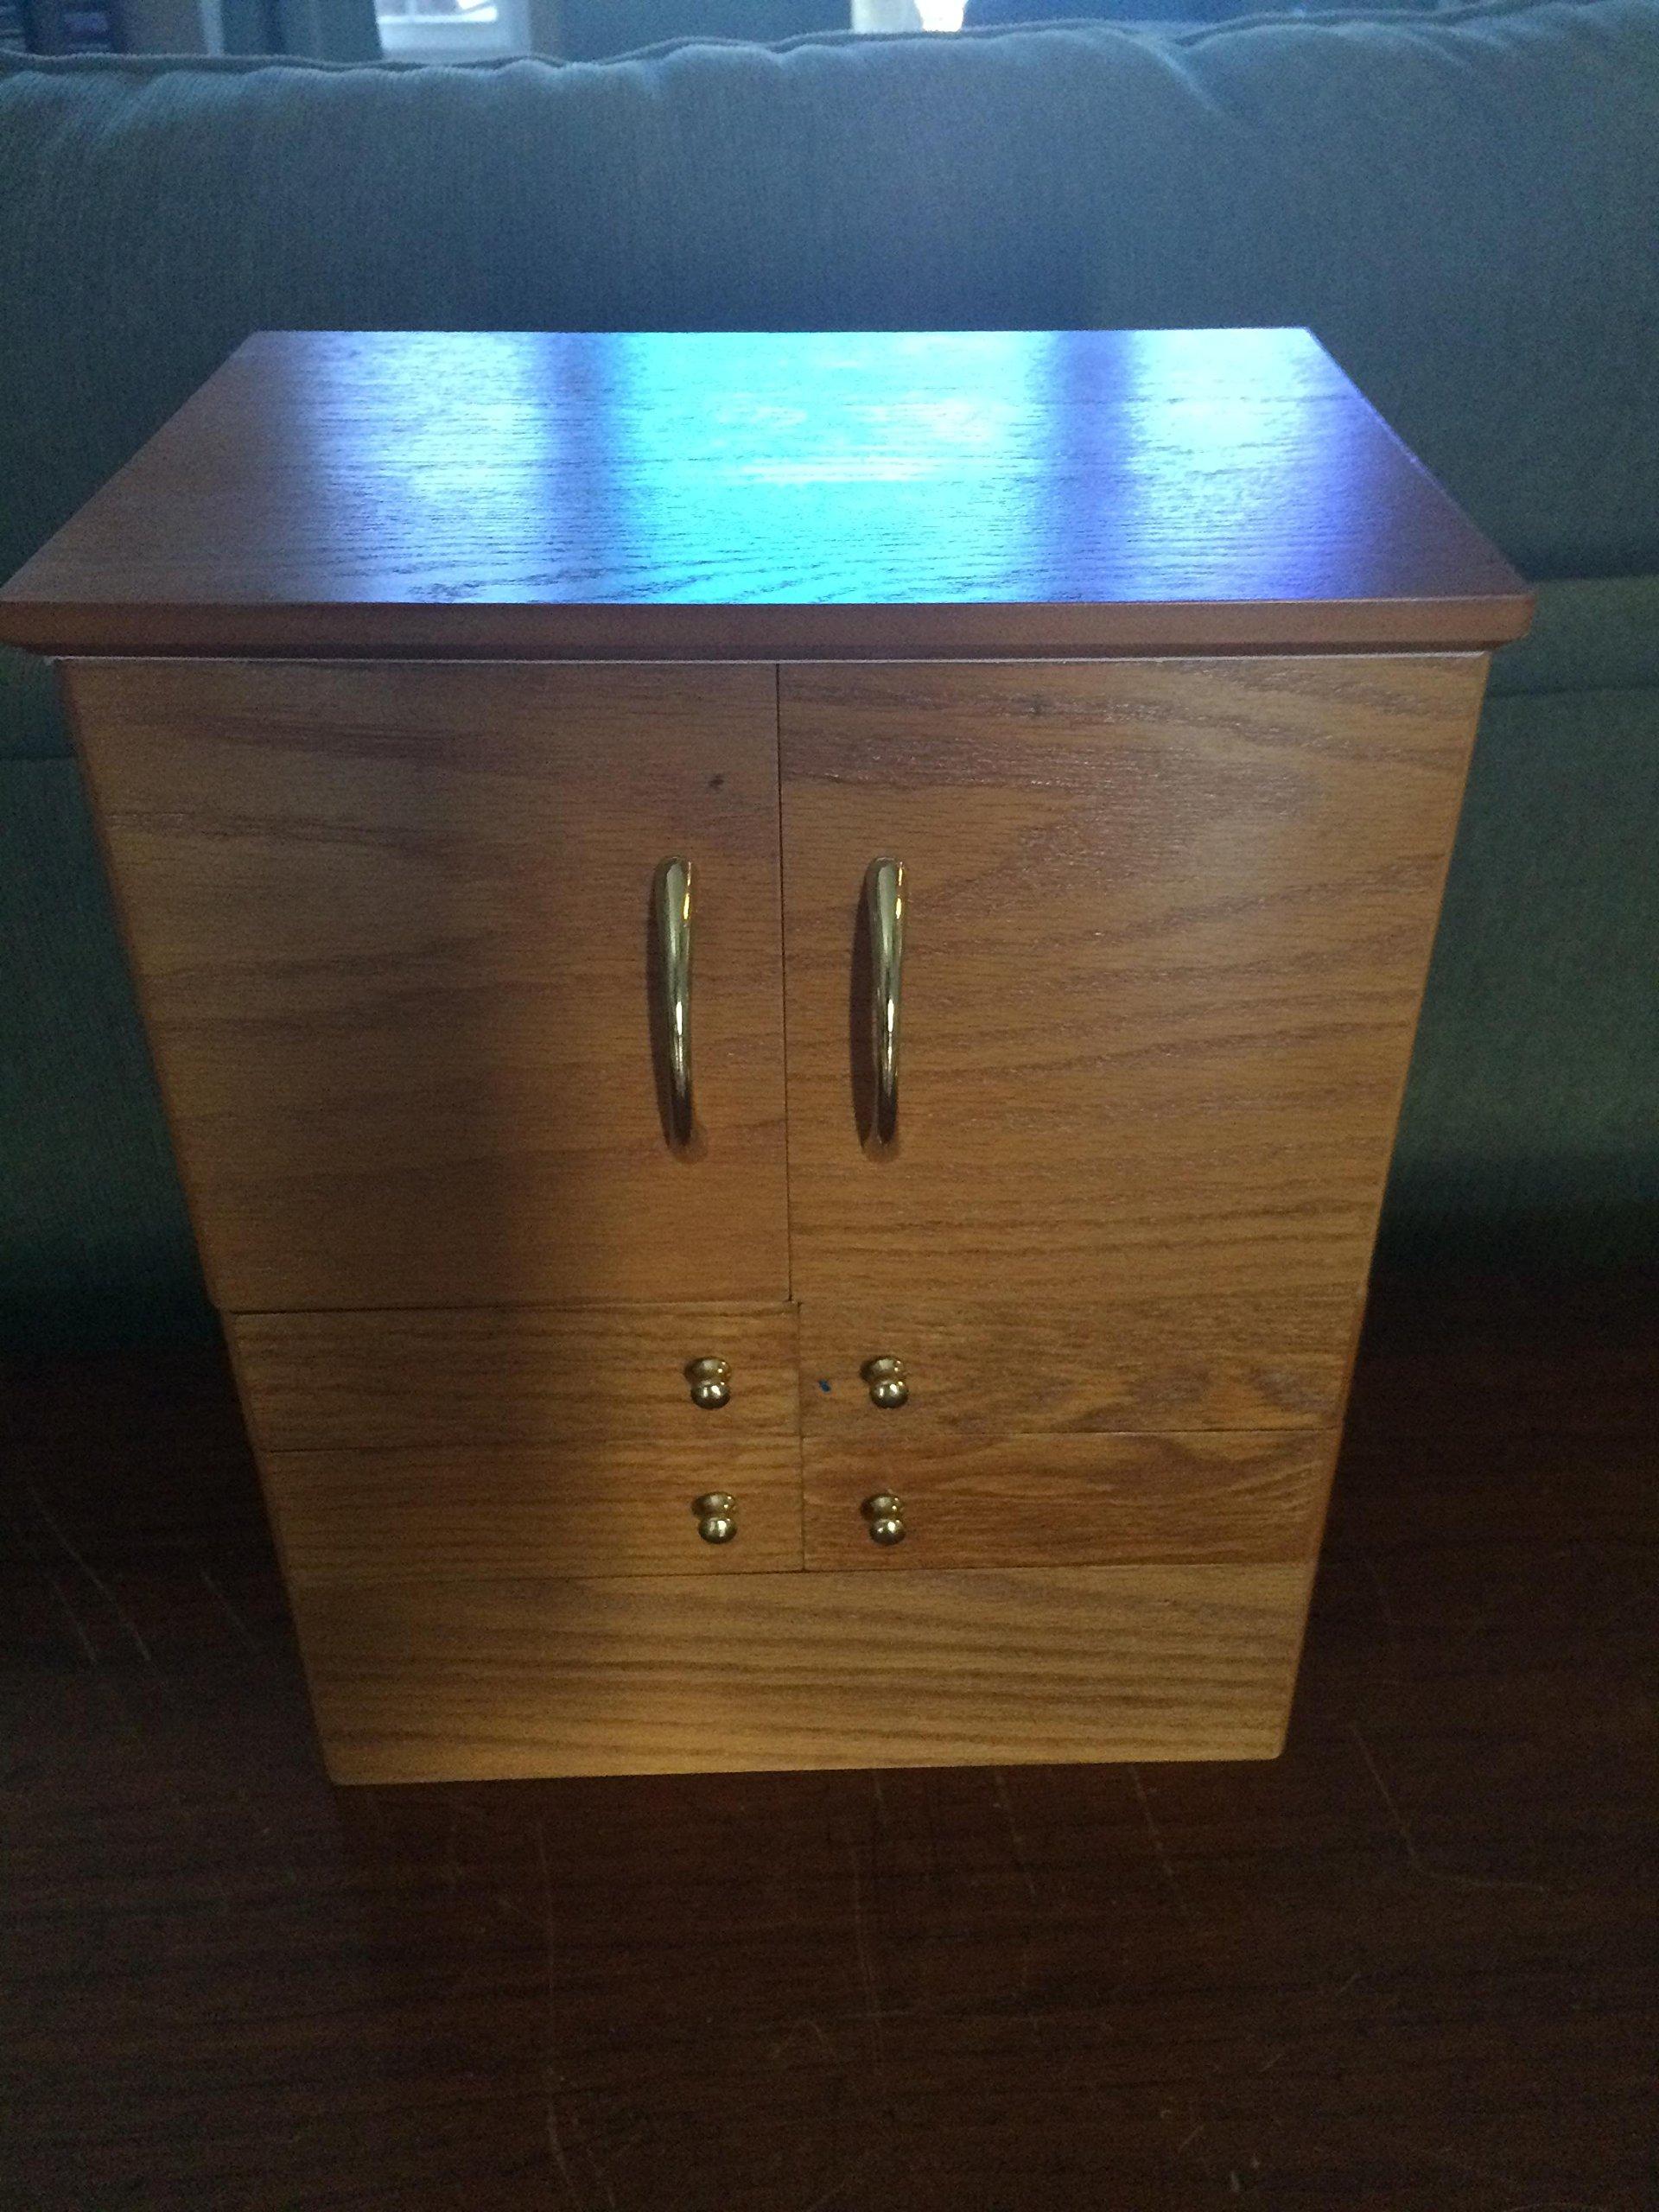 Luxury Deluxe Wood Cosmetic Box w/Mirror by Lori Greiner - Oak